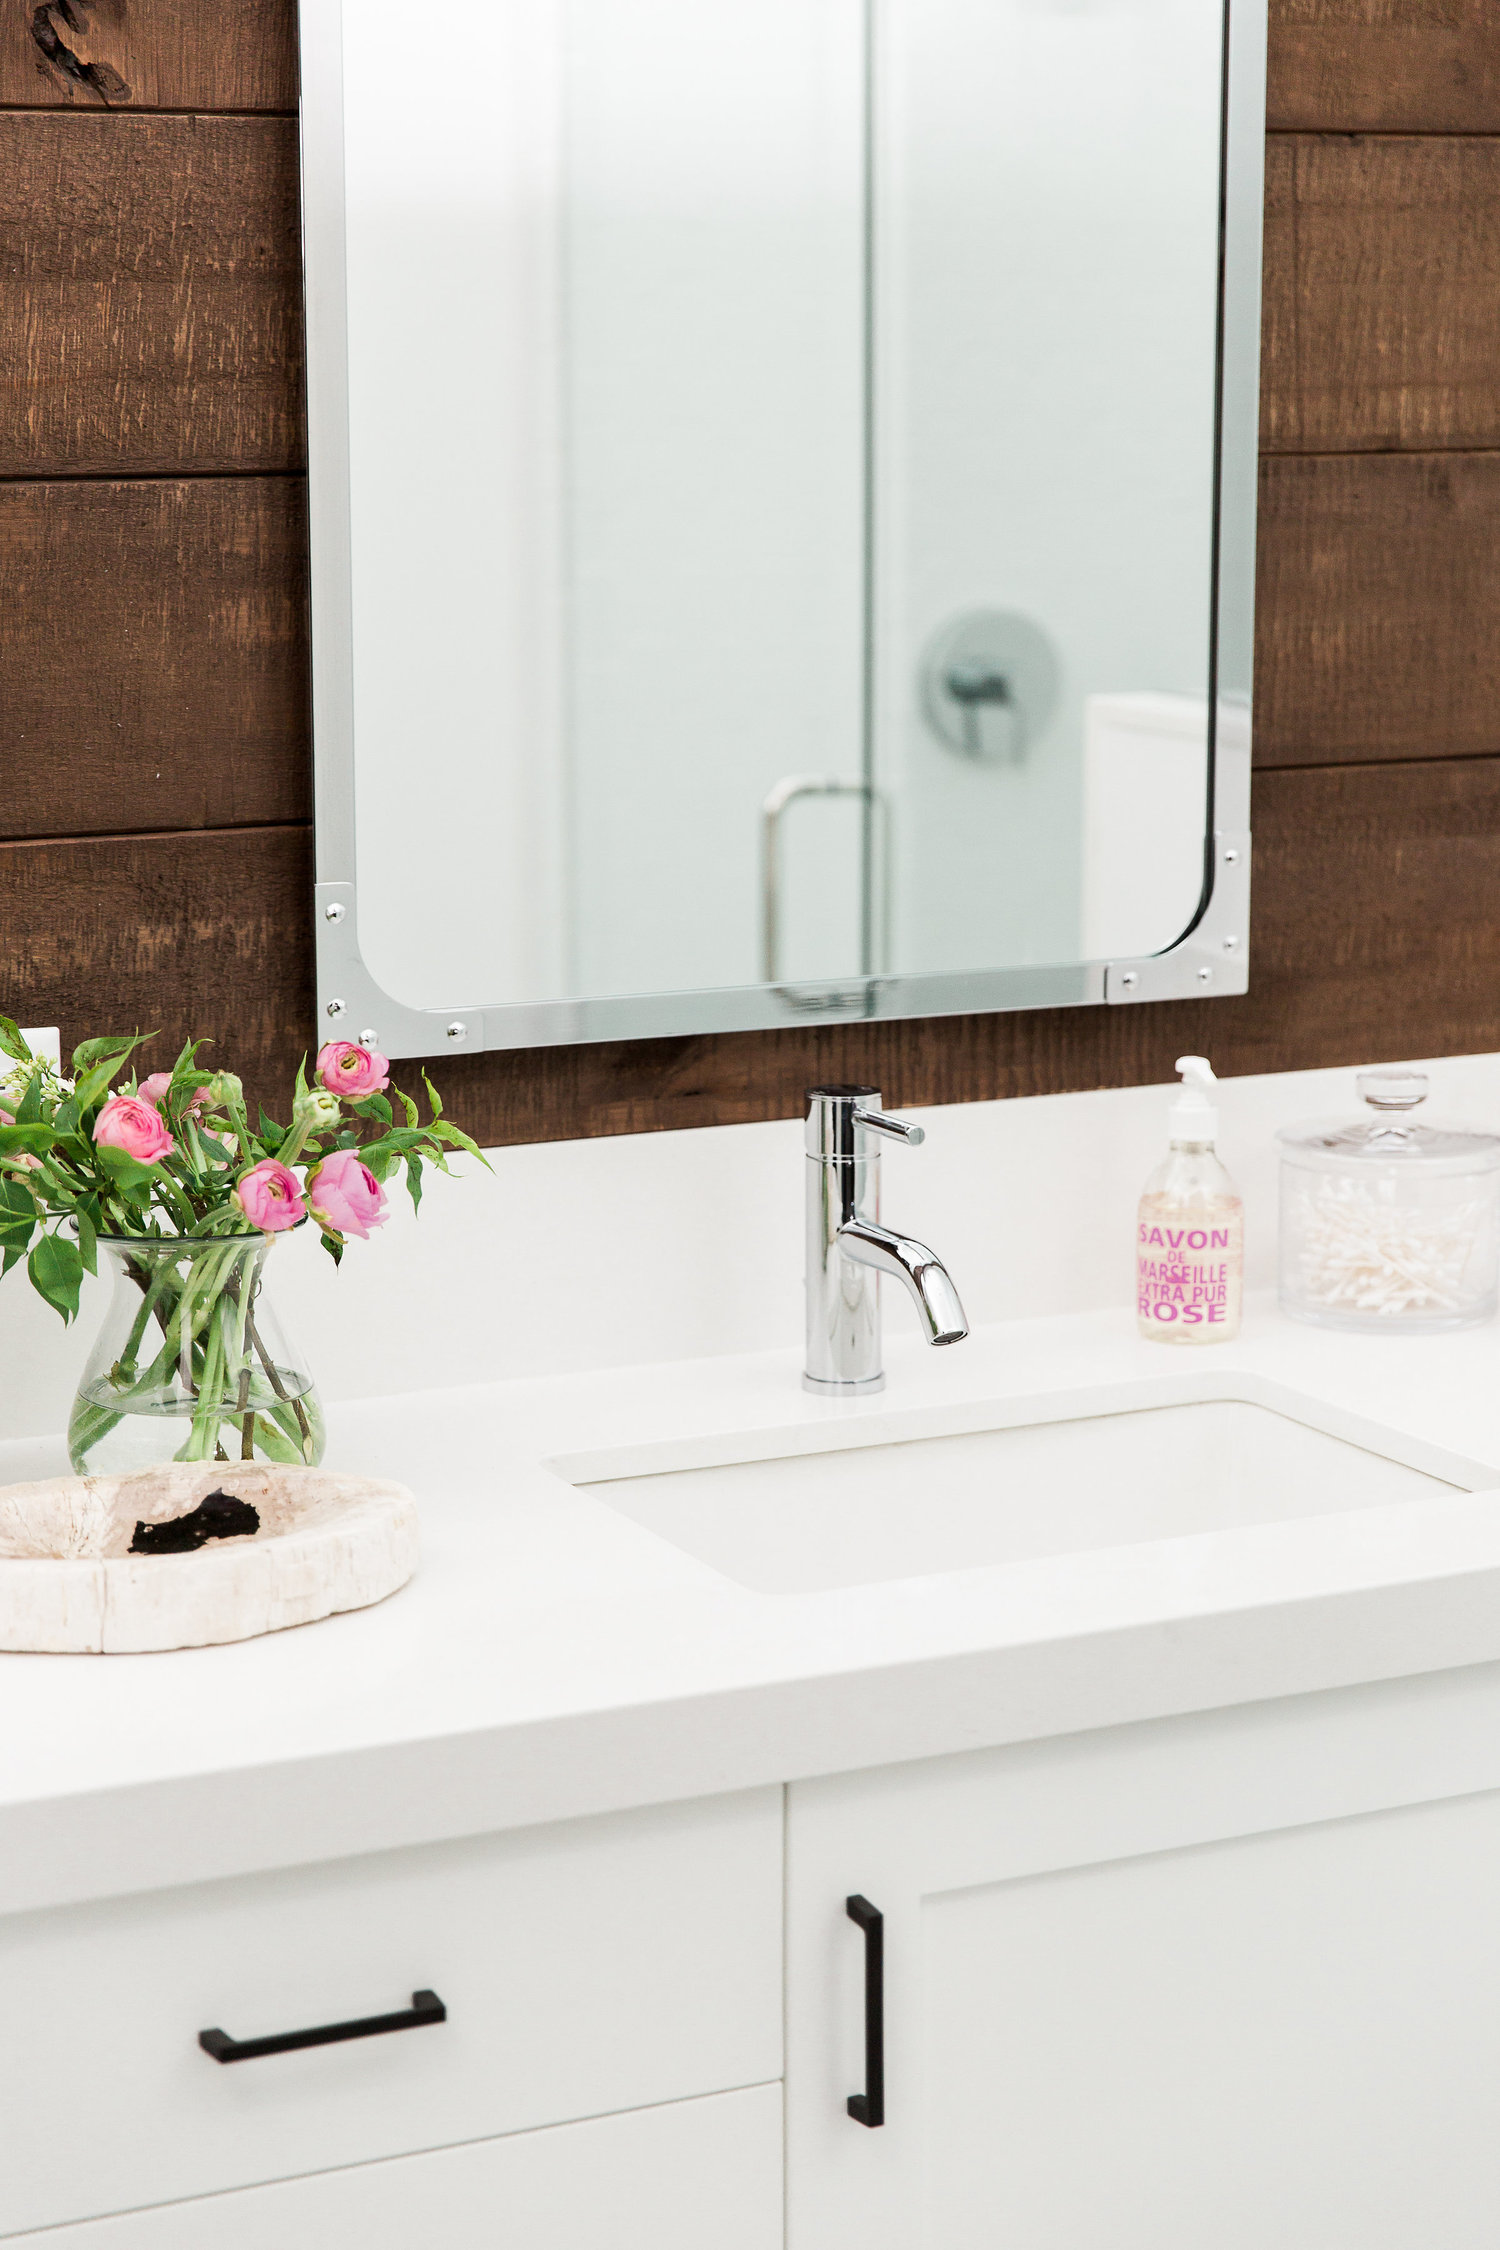 Mirror hanging above bathroom sink